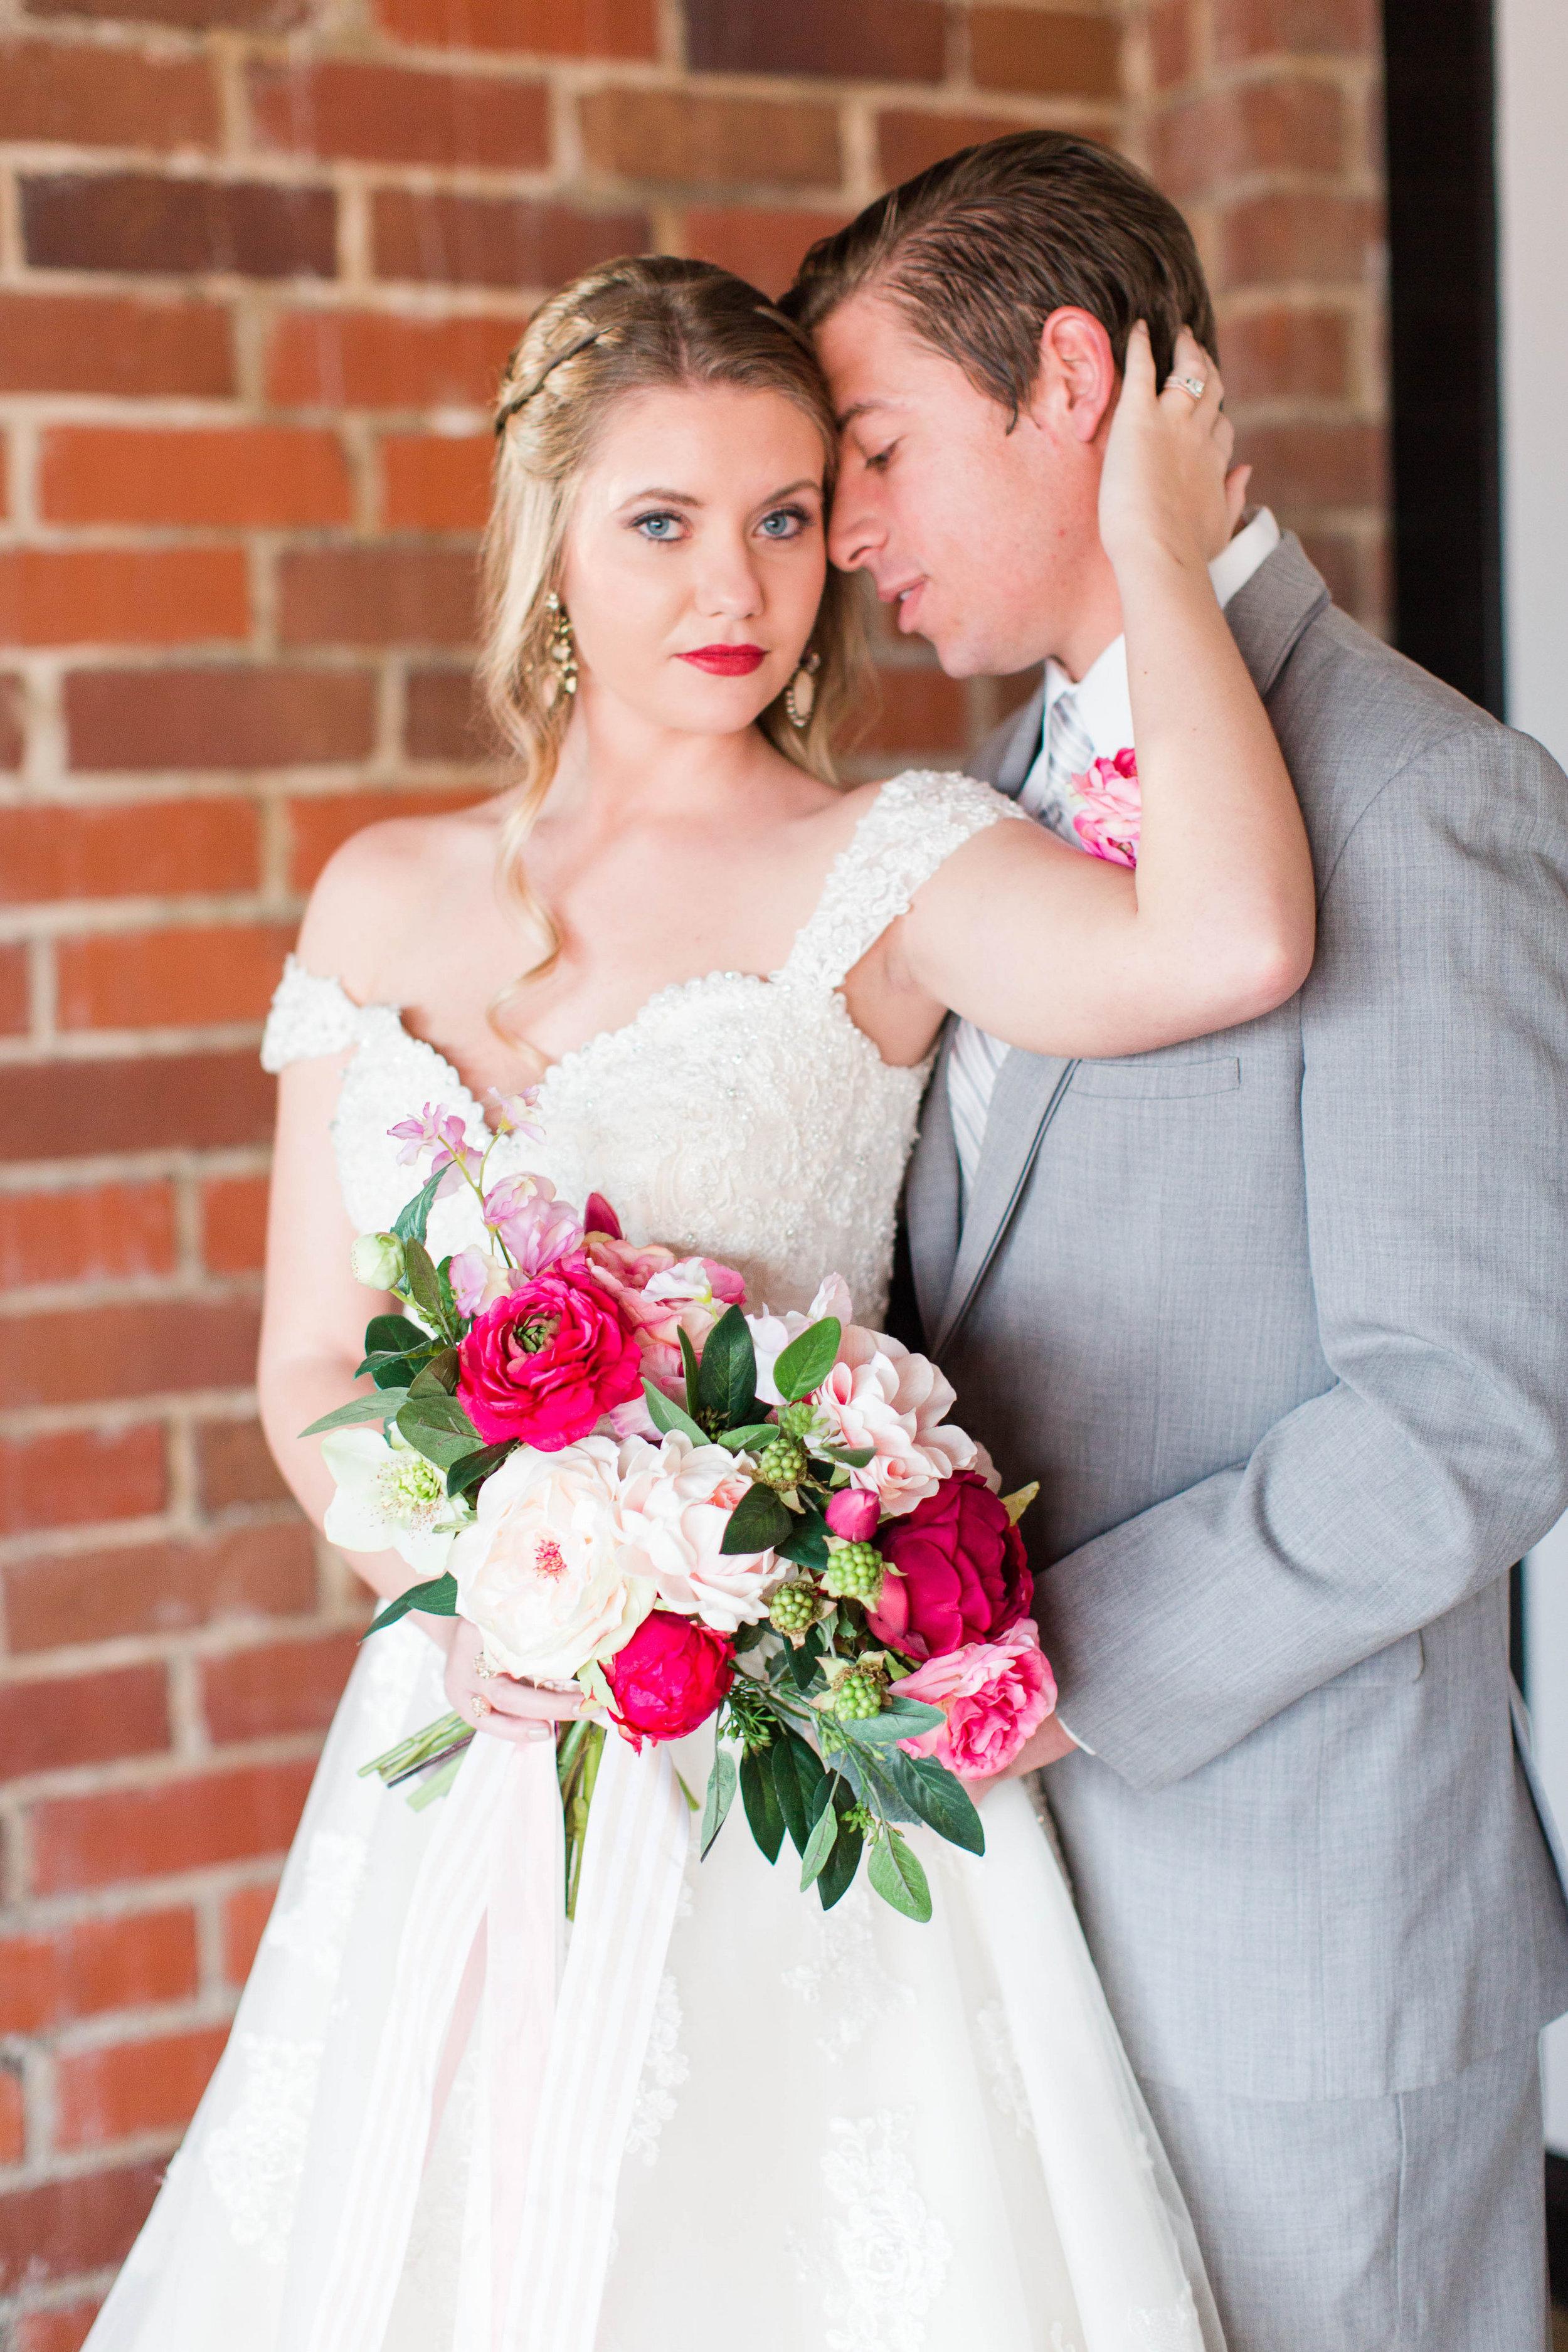 afloral-fake-flower-wedding-ivory-and-beau-bridal-boutique-maggie-sottero-saffron-the-hall-on-vine-wedding-statesboro-wedding-savannah-wedding-kristian-designs-rachel-strickland-photography-savannah-bridal-southern-bride-savannah-bride-13.jpg